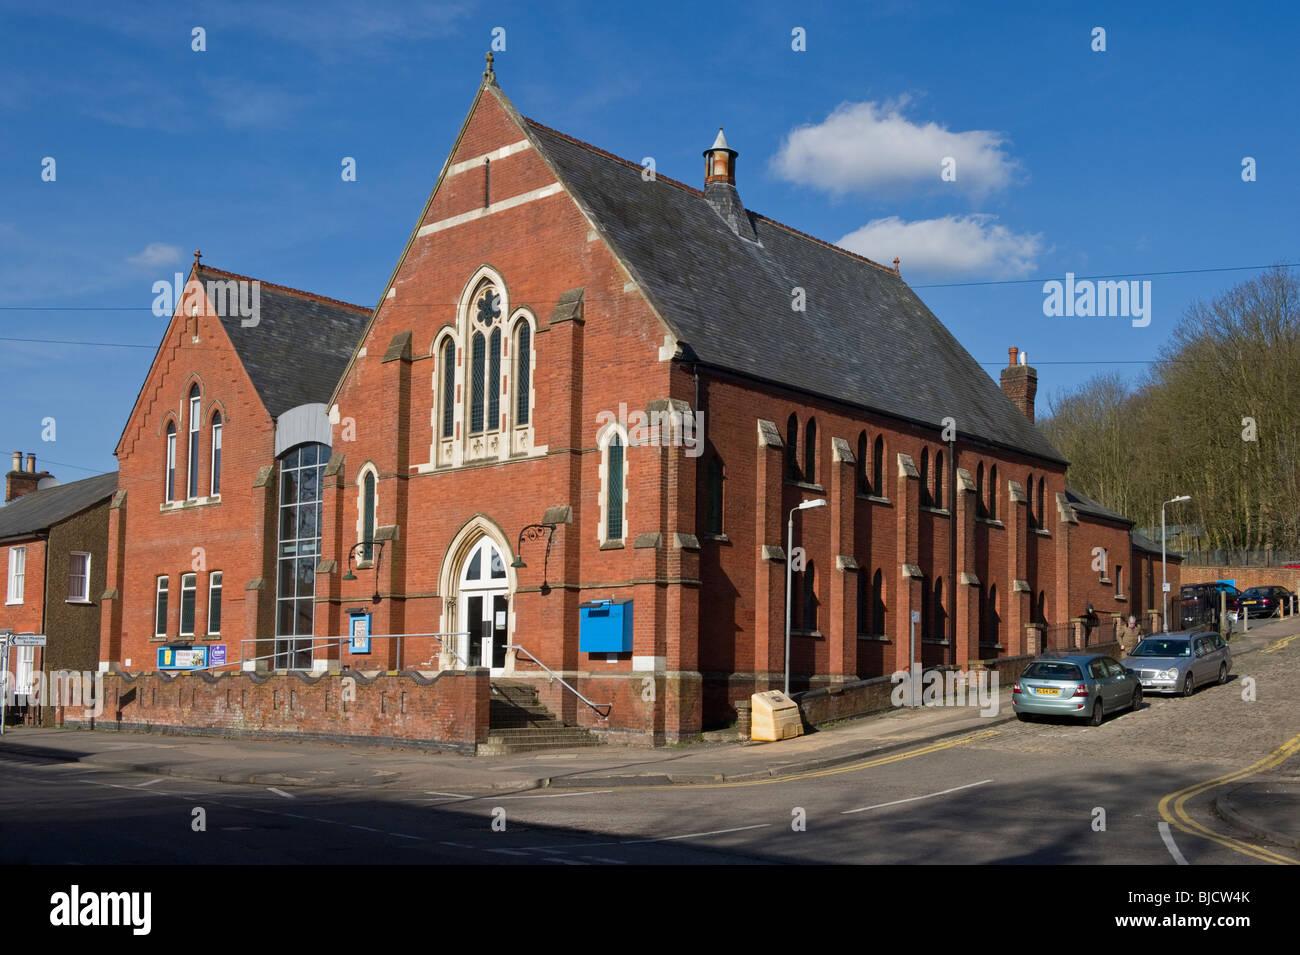 Trinity Baptist church a traditional red brick built church, an ecclesiastical church building  in Chesham Buckinghamshire - Stock Image